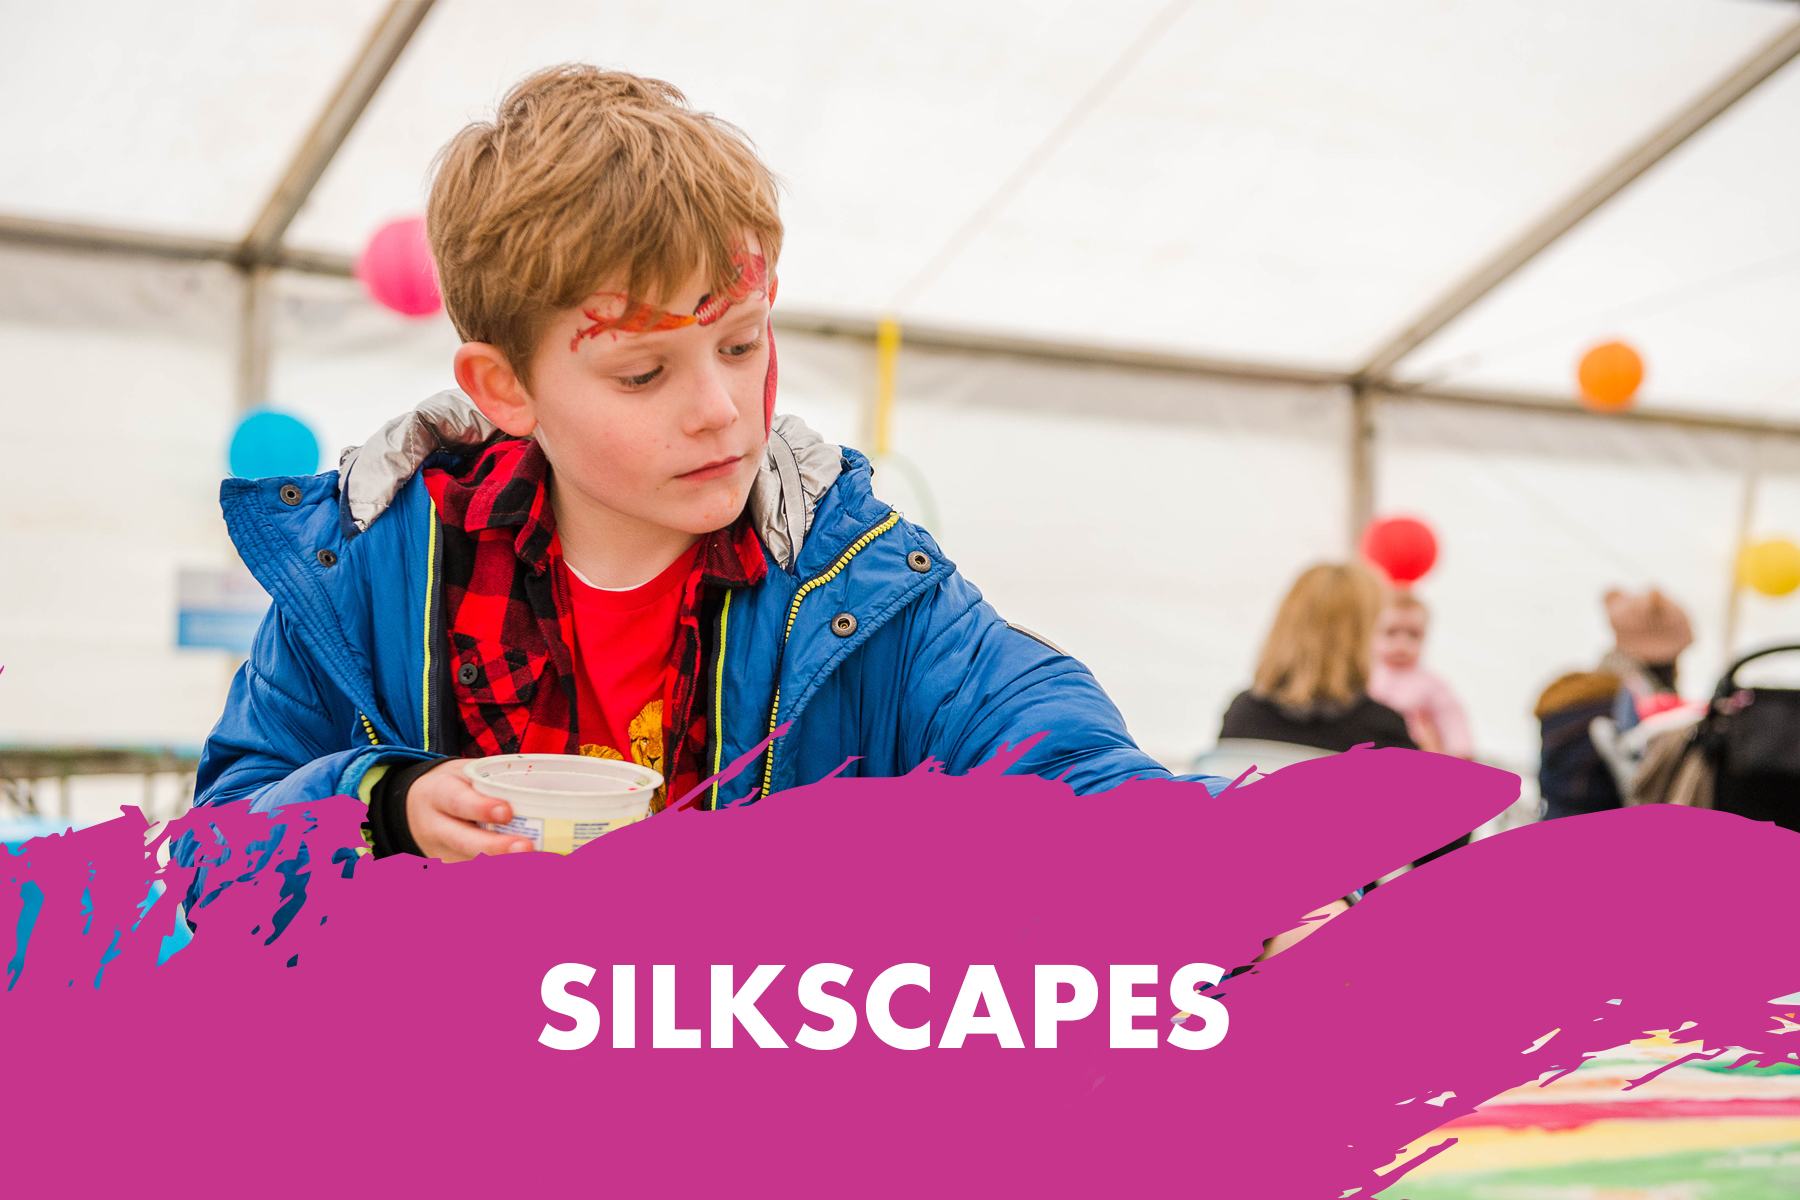 silkscapes_large.jpg